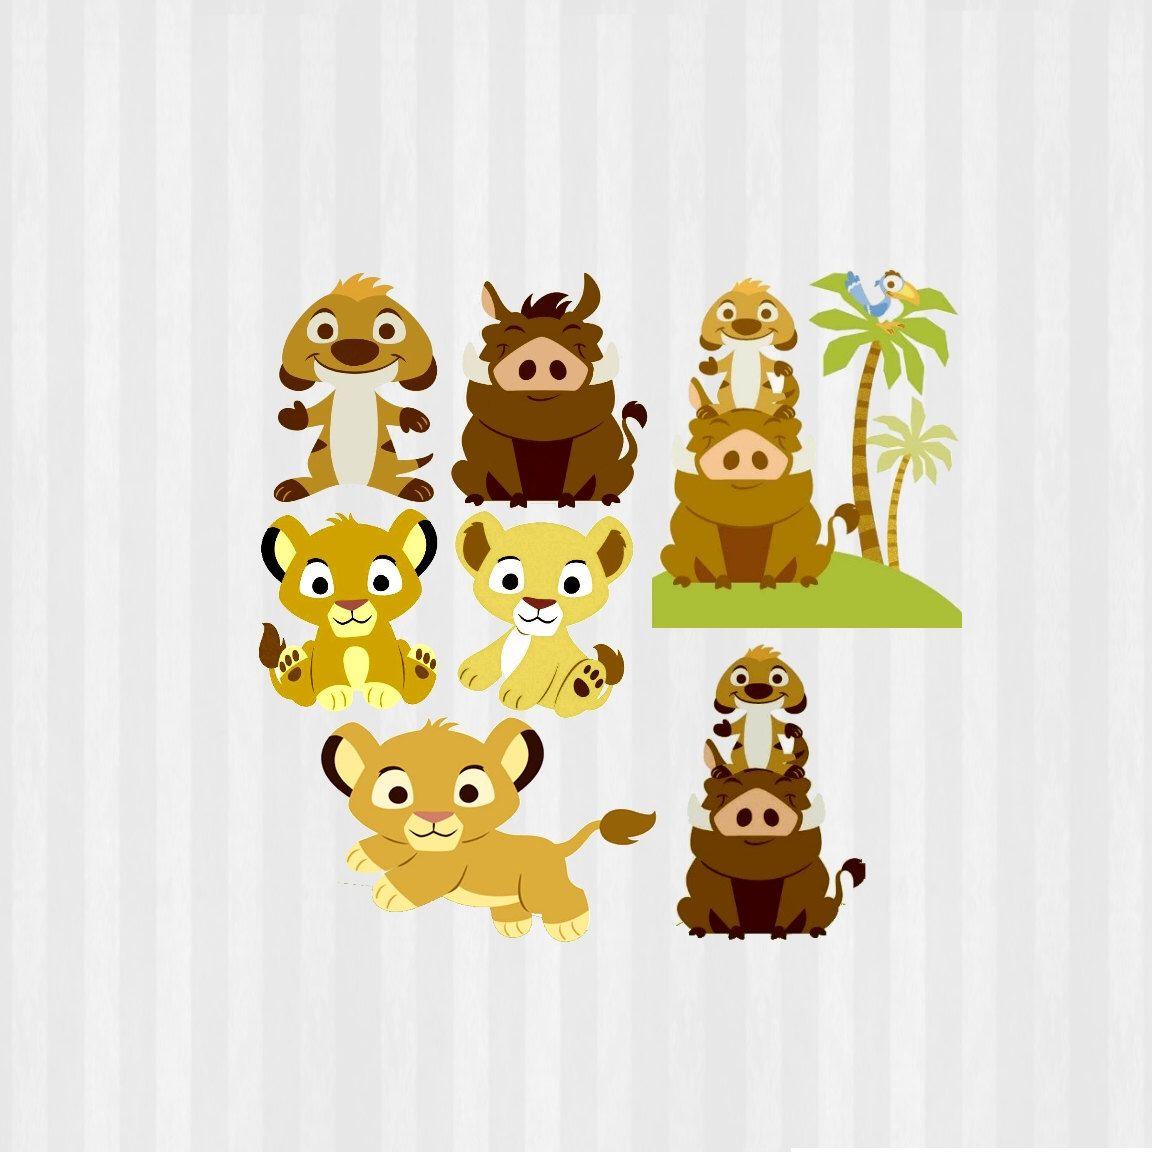 Bebé León rey Clip art, SVG Baby Lion King, Rey León baby ...